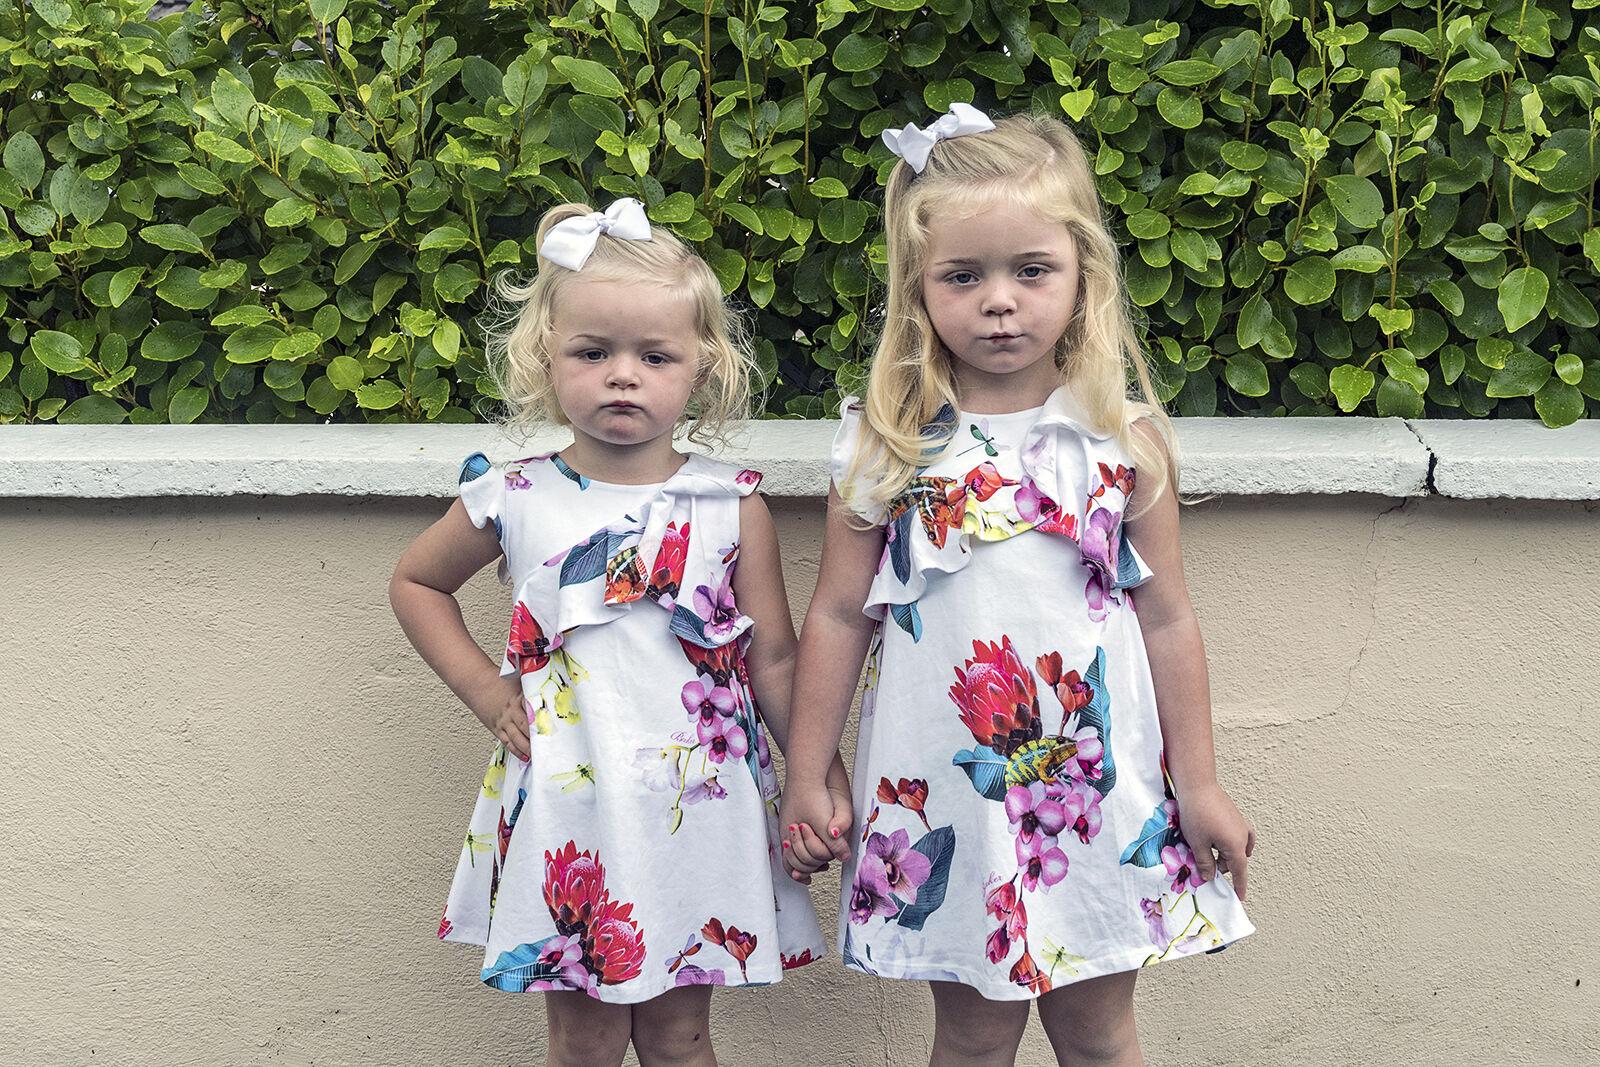 Tropical Flowers Dresses, Puck Fair, Kerry, Ireland 2020